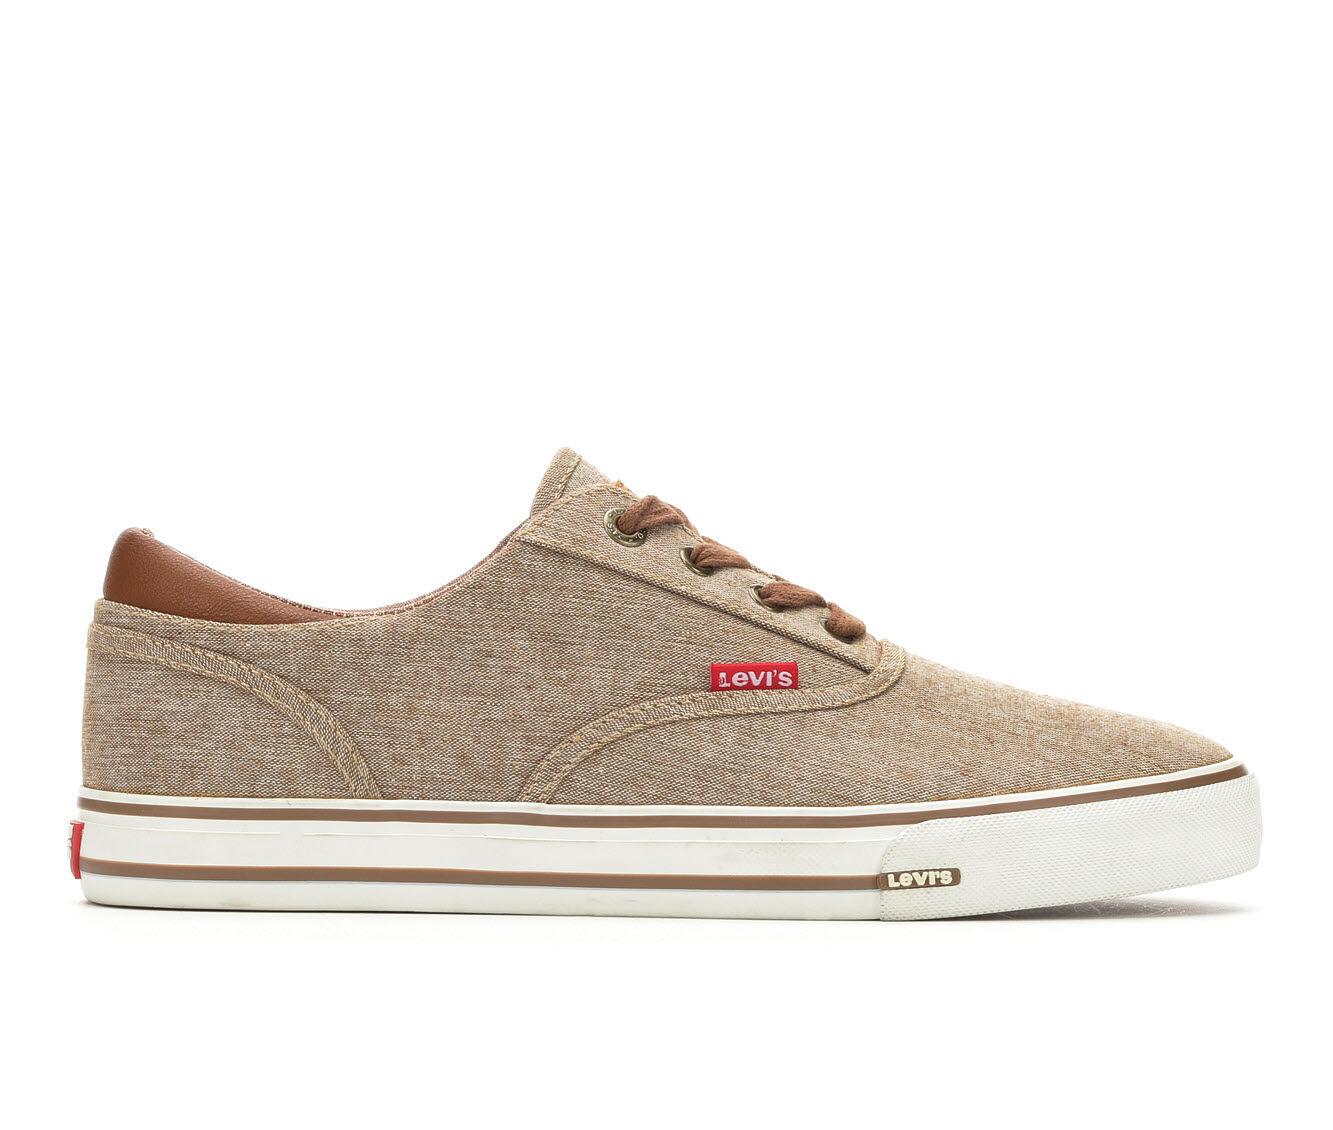 uk shoes_kd1768